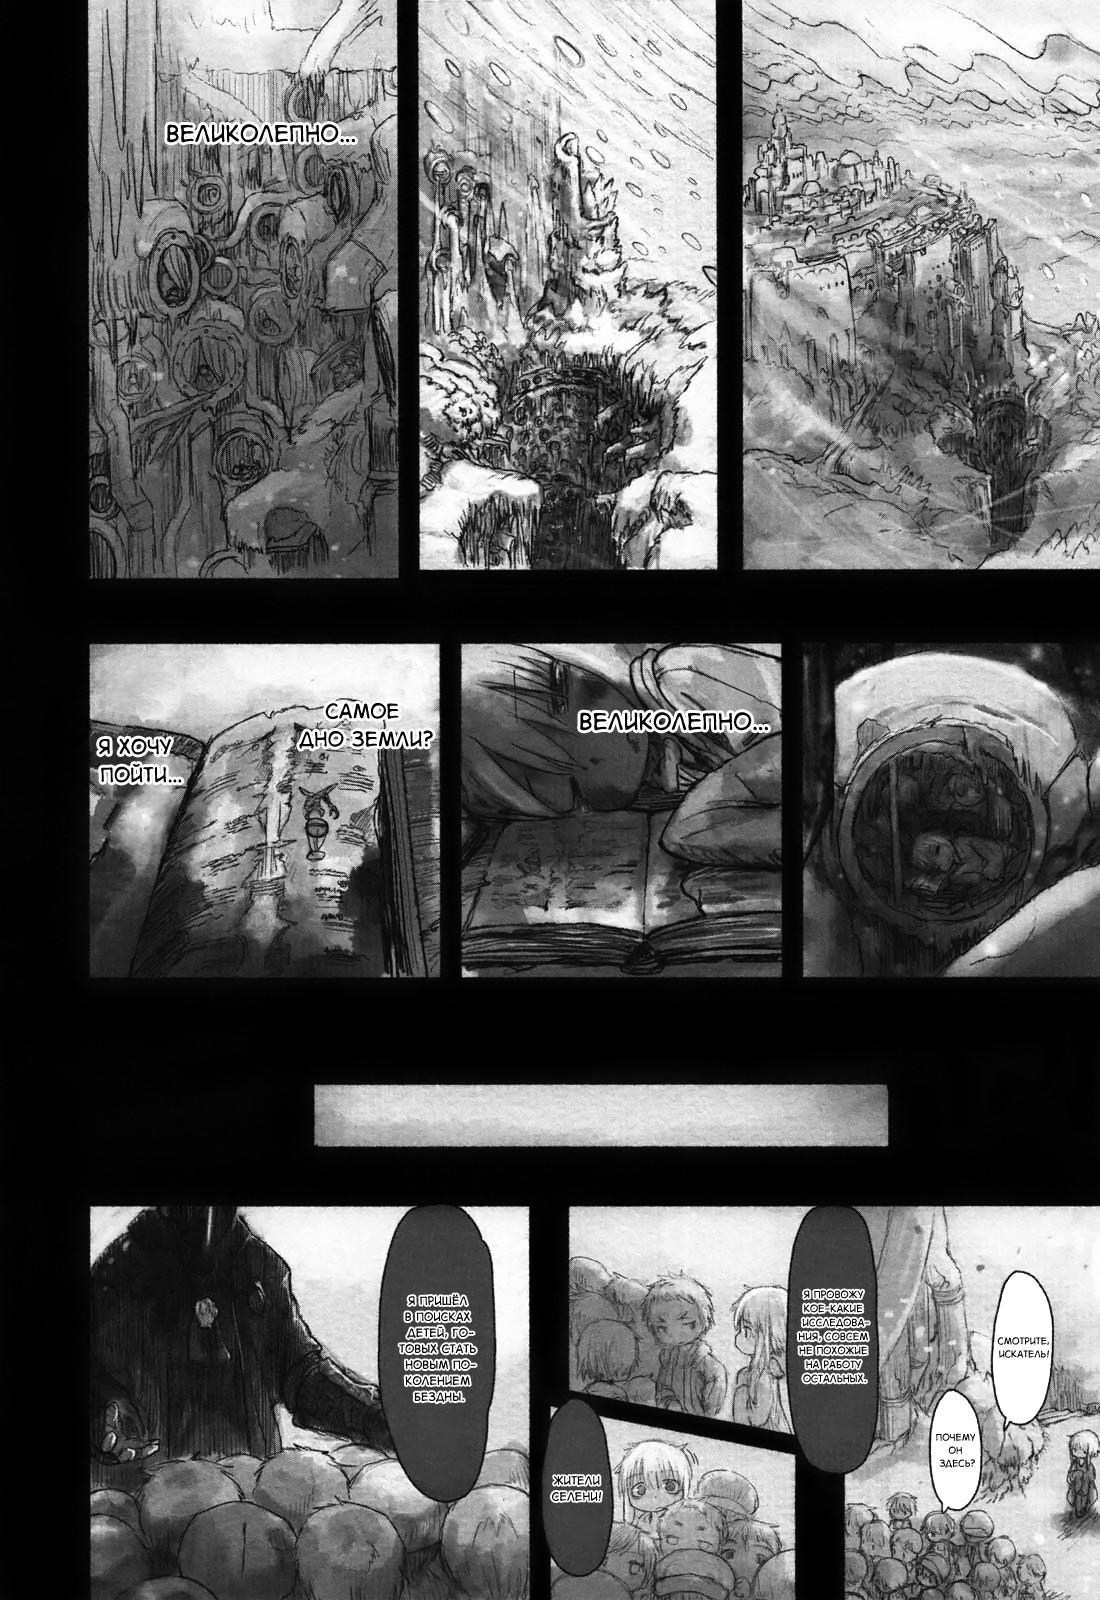 https://r1.ninemanga.com/comics/pic2/54/32566/389376/1513634752366.jpg Page 2